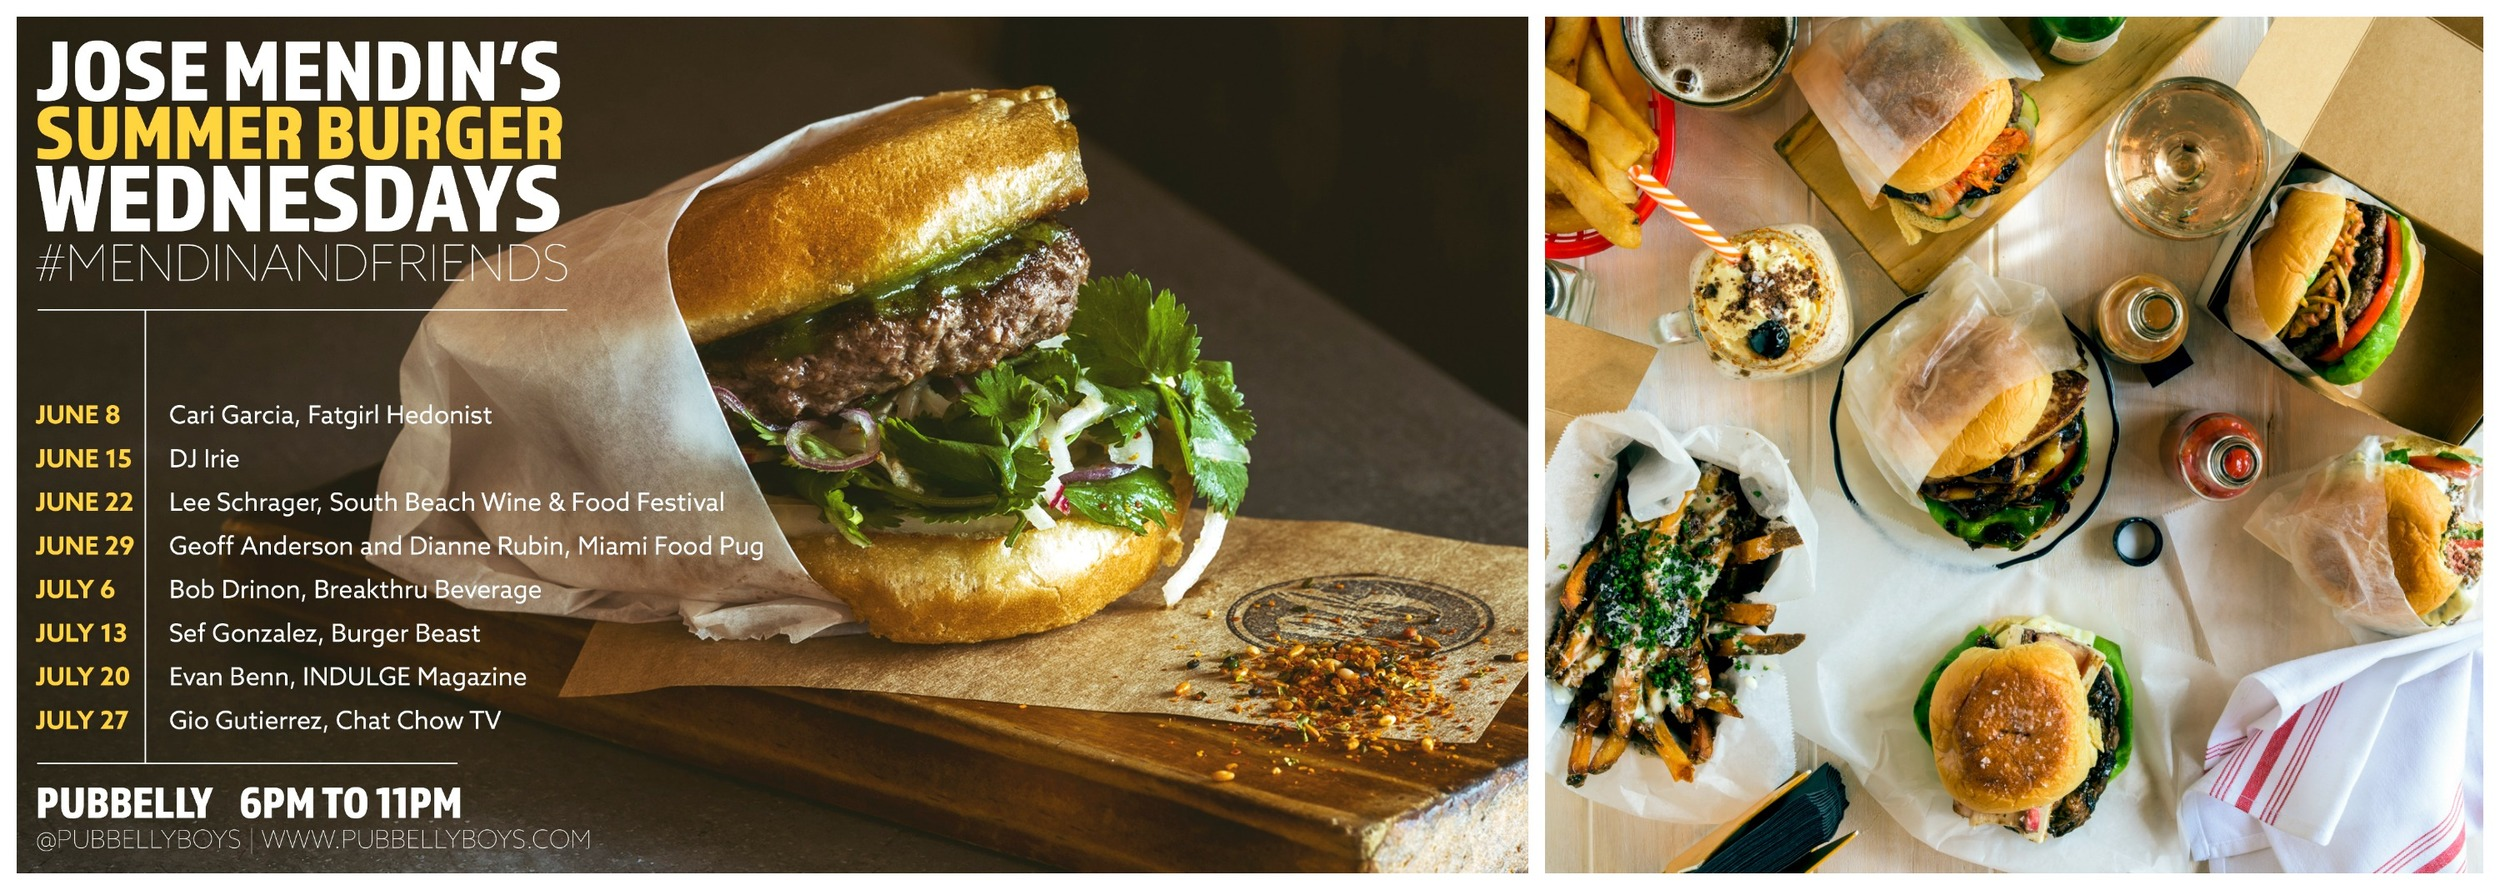 Pubbelly Burger Wednesdays Miami Beach